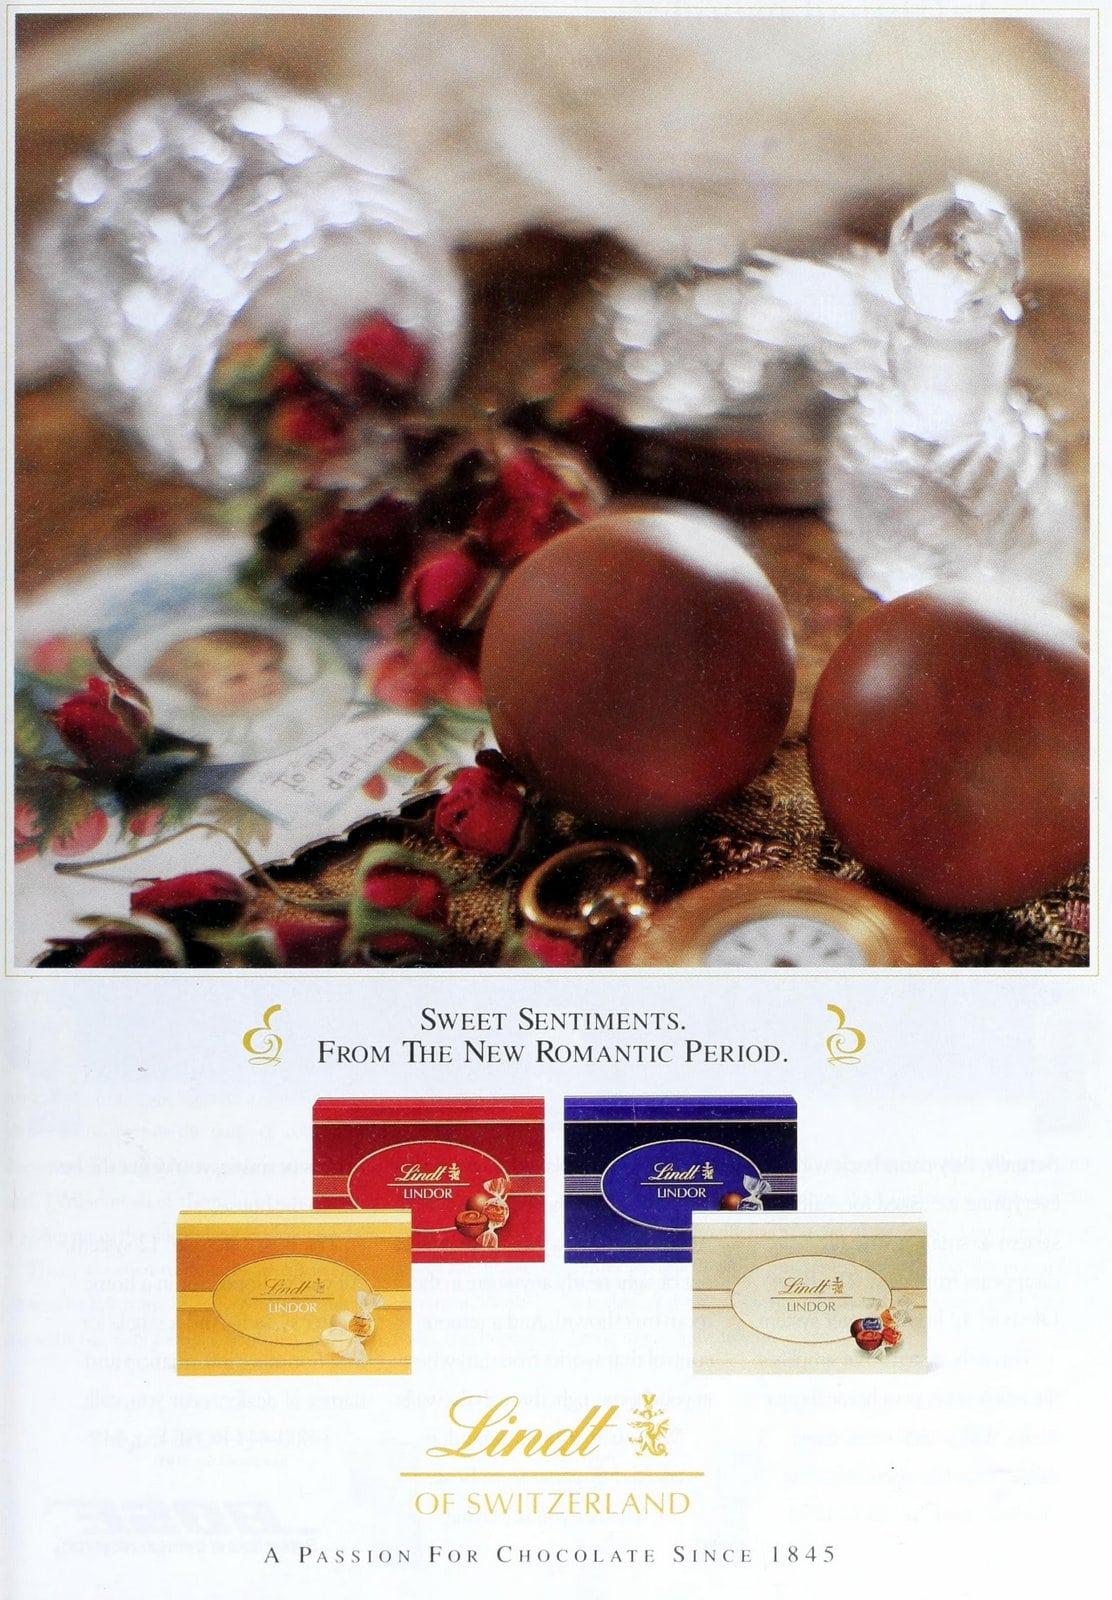 Lindt truffles - Vintage 90s chocolate candies (1994)